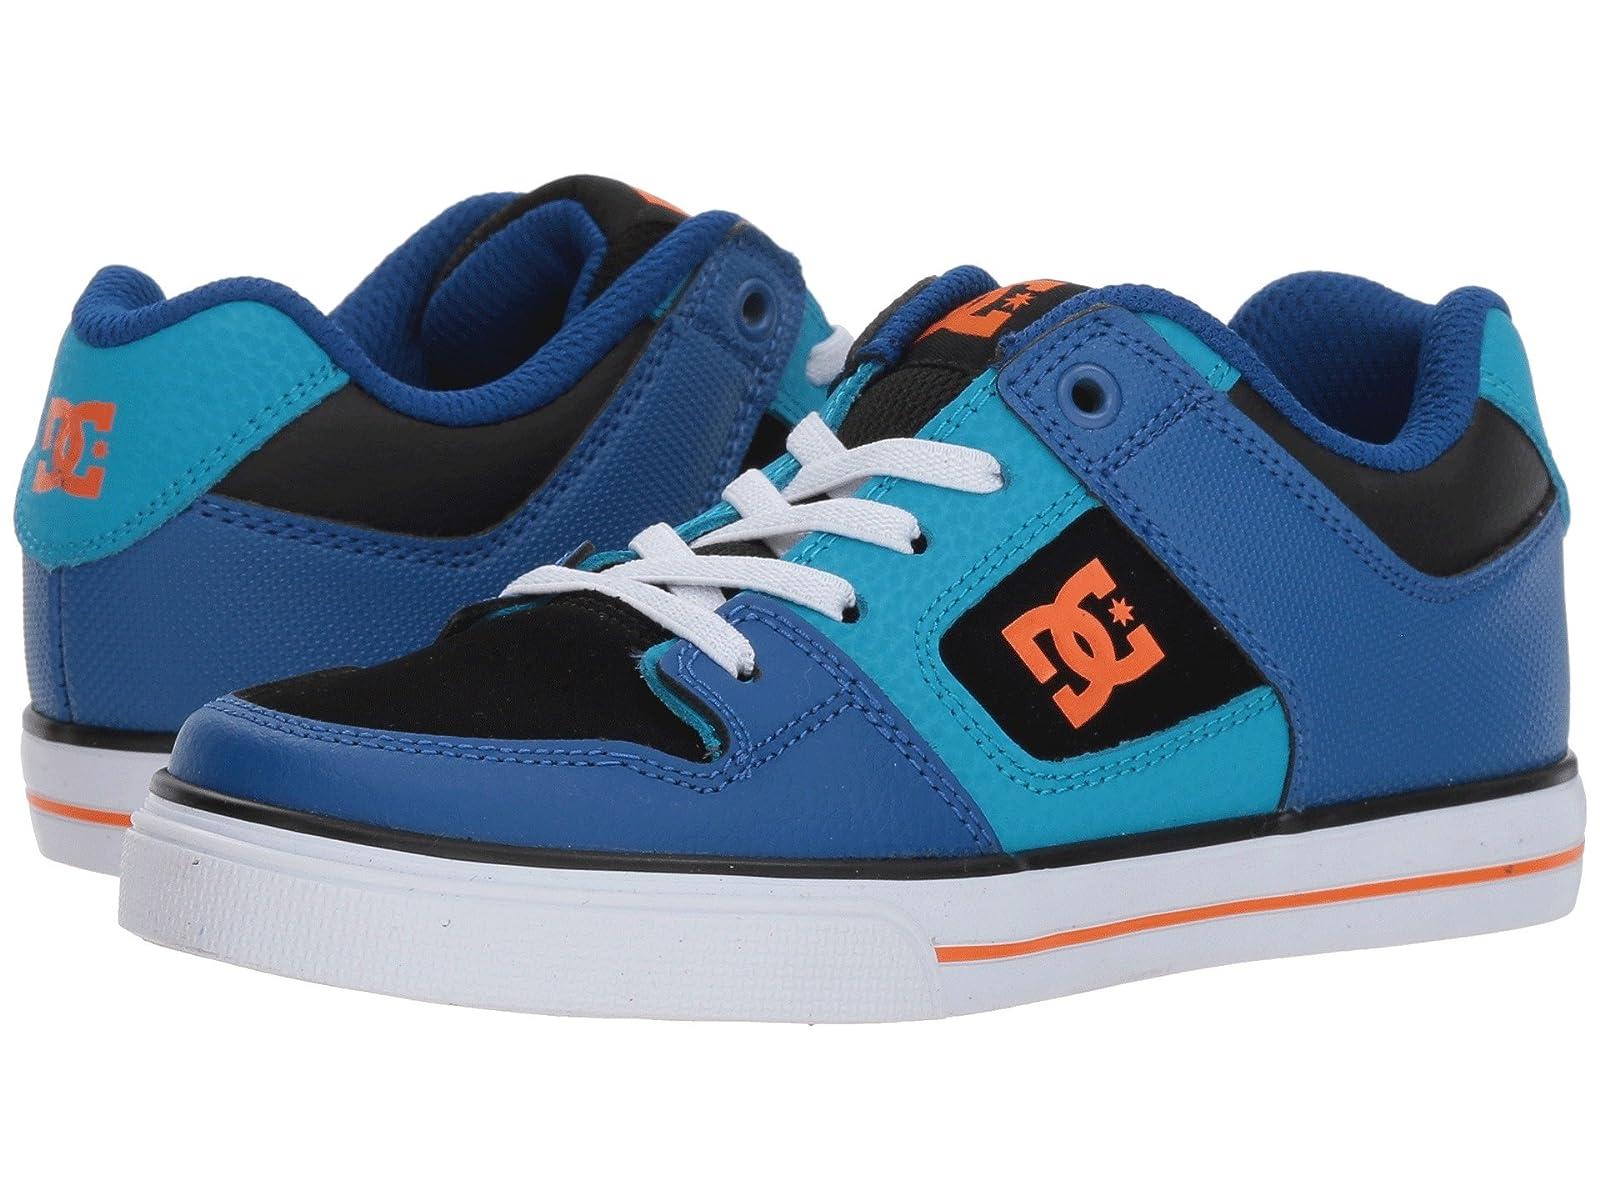 DC Kids Pure Elastic (Little Kid/Big Kid)Atmospheric grades have affordable shoes